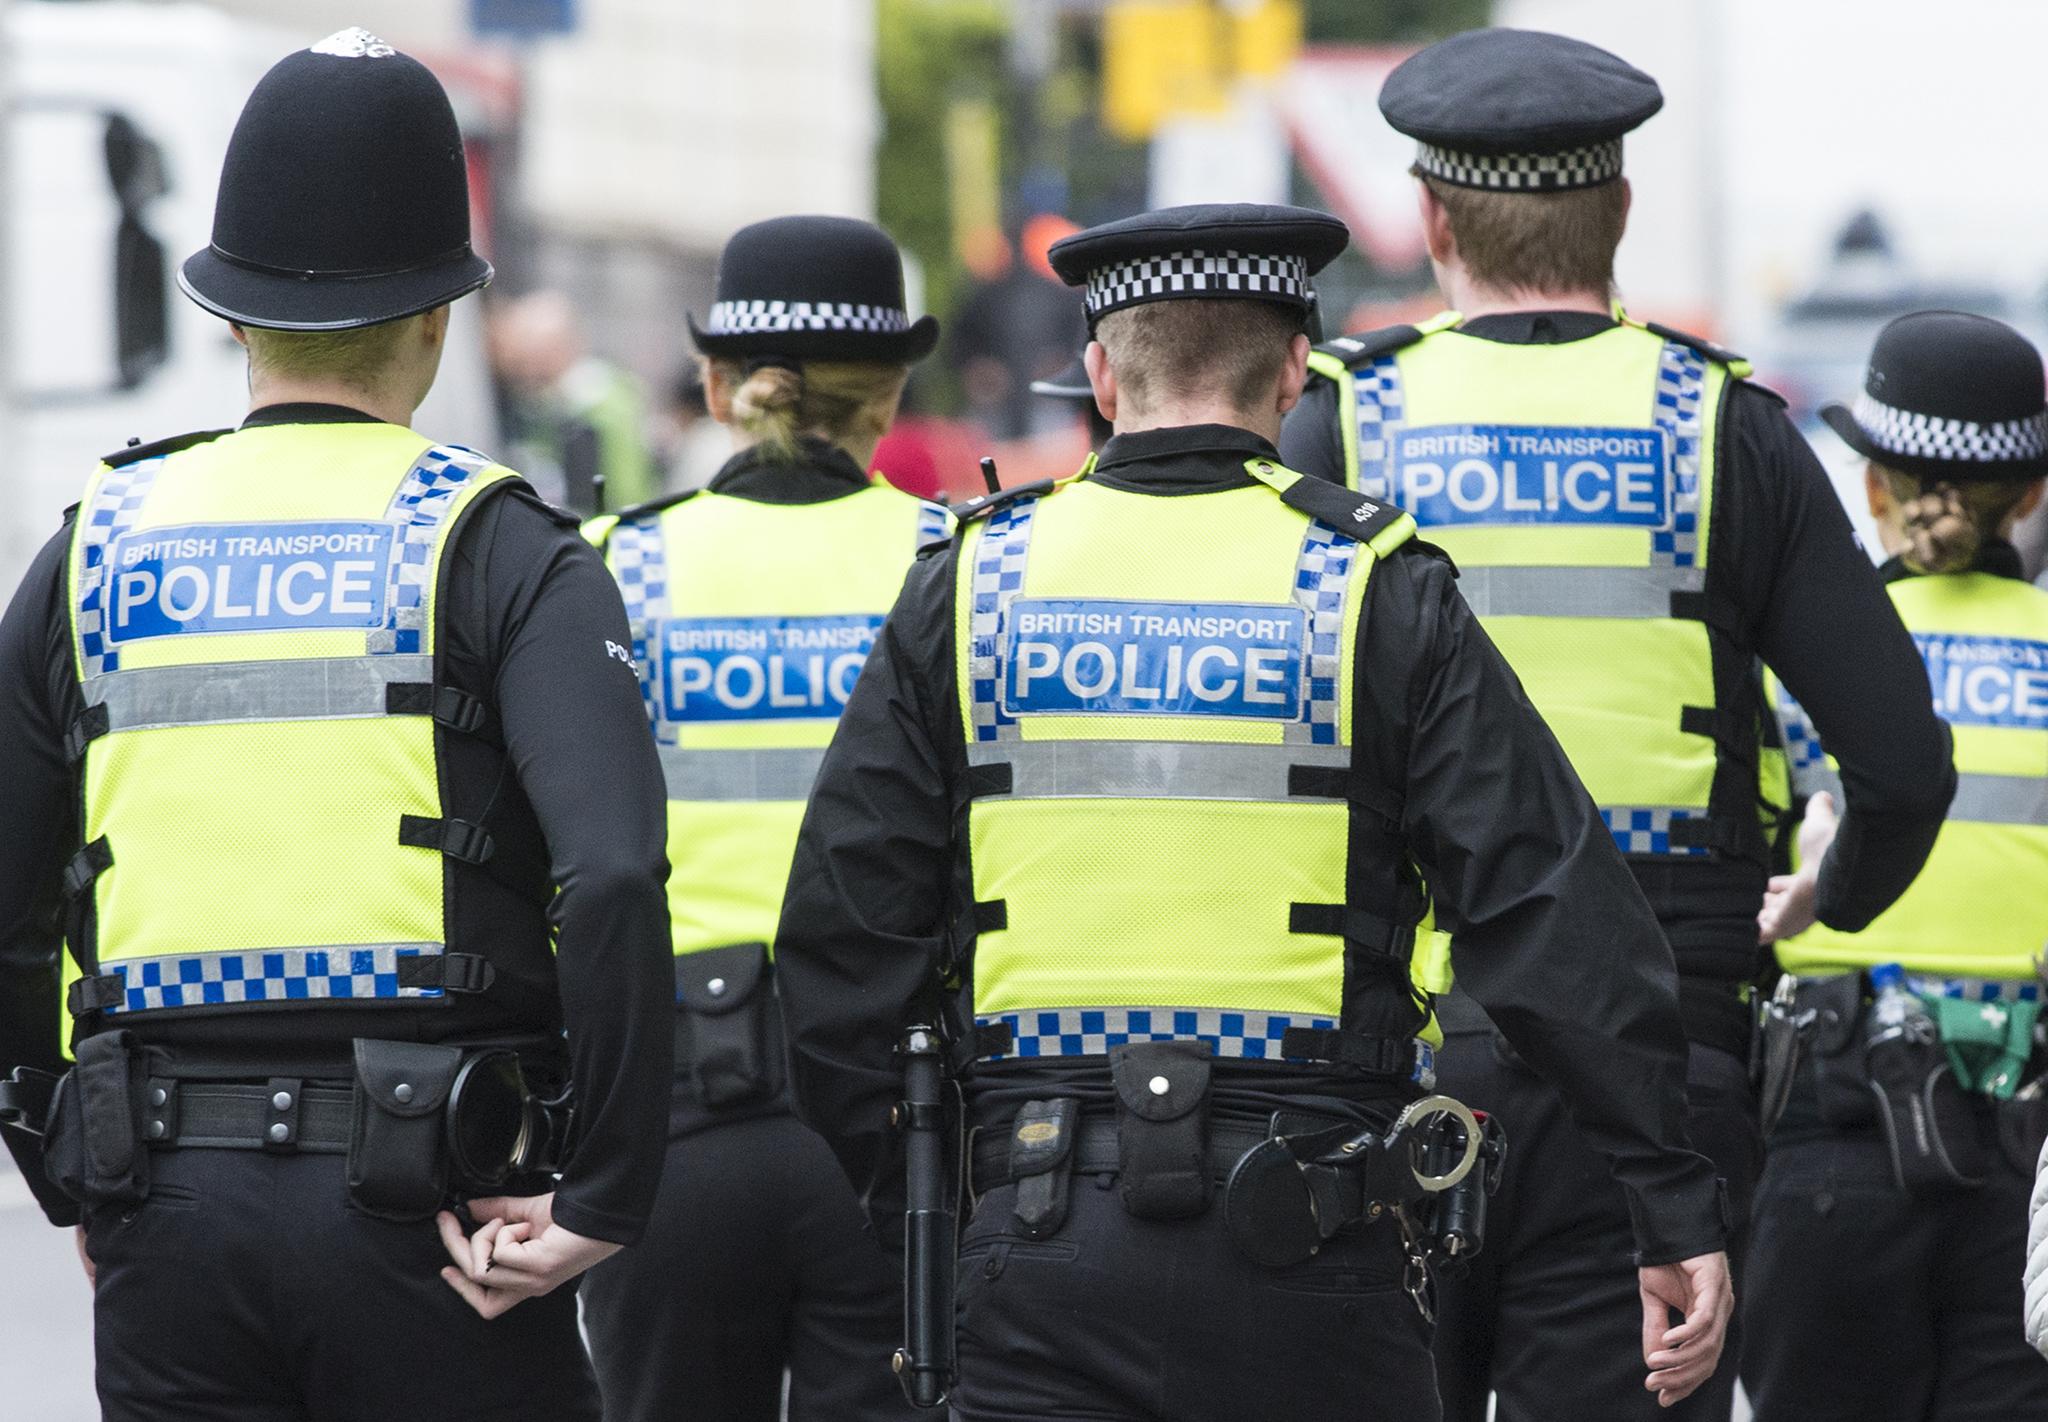 Police cuts